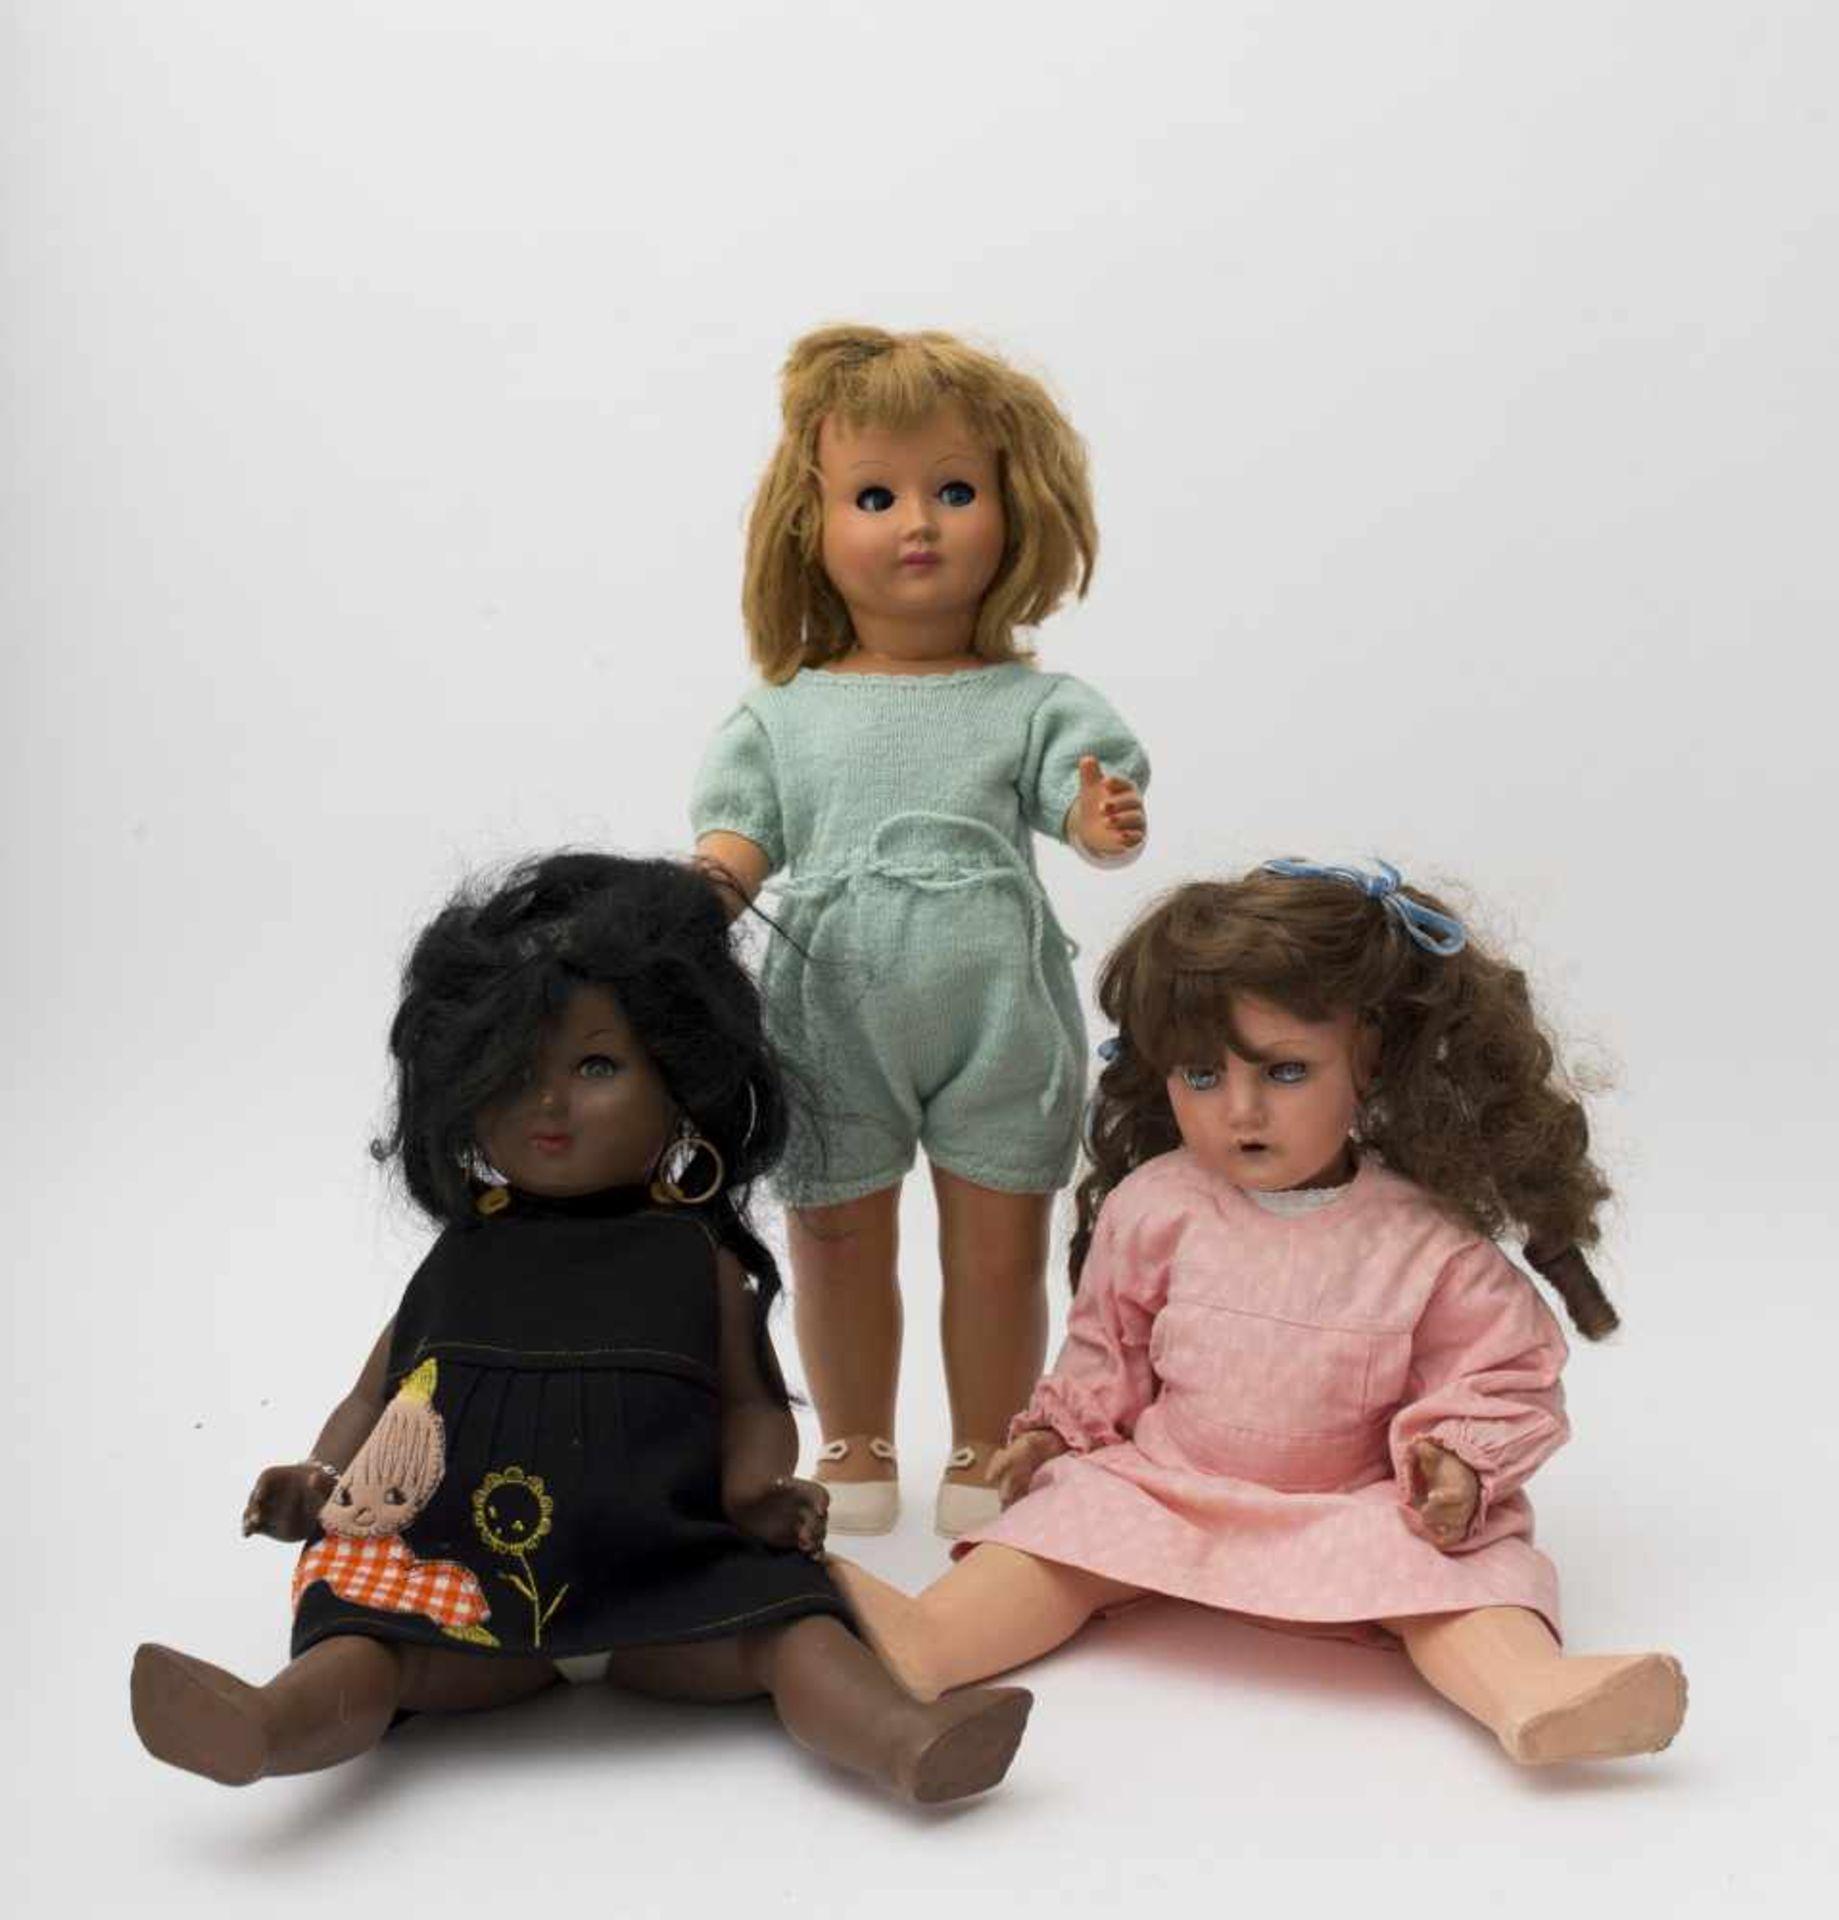 Three composition dolls ATHENA PIACENZA 50 and UNICA Belgium, H=40 to 52cm.